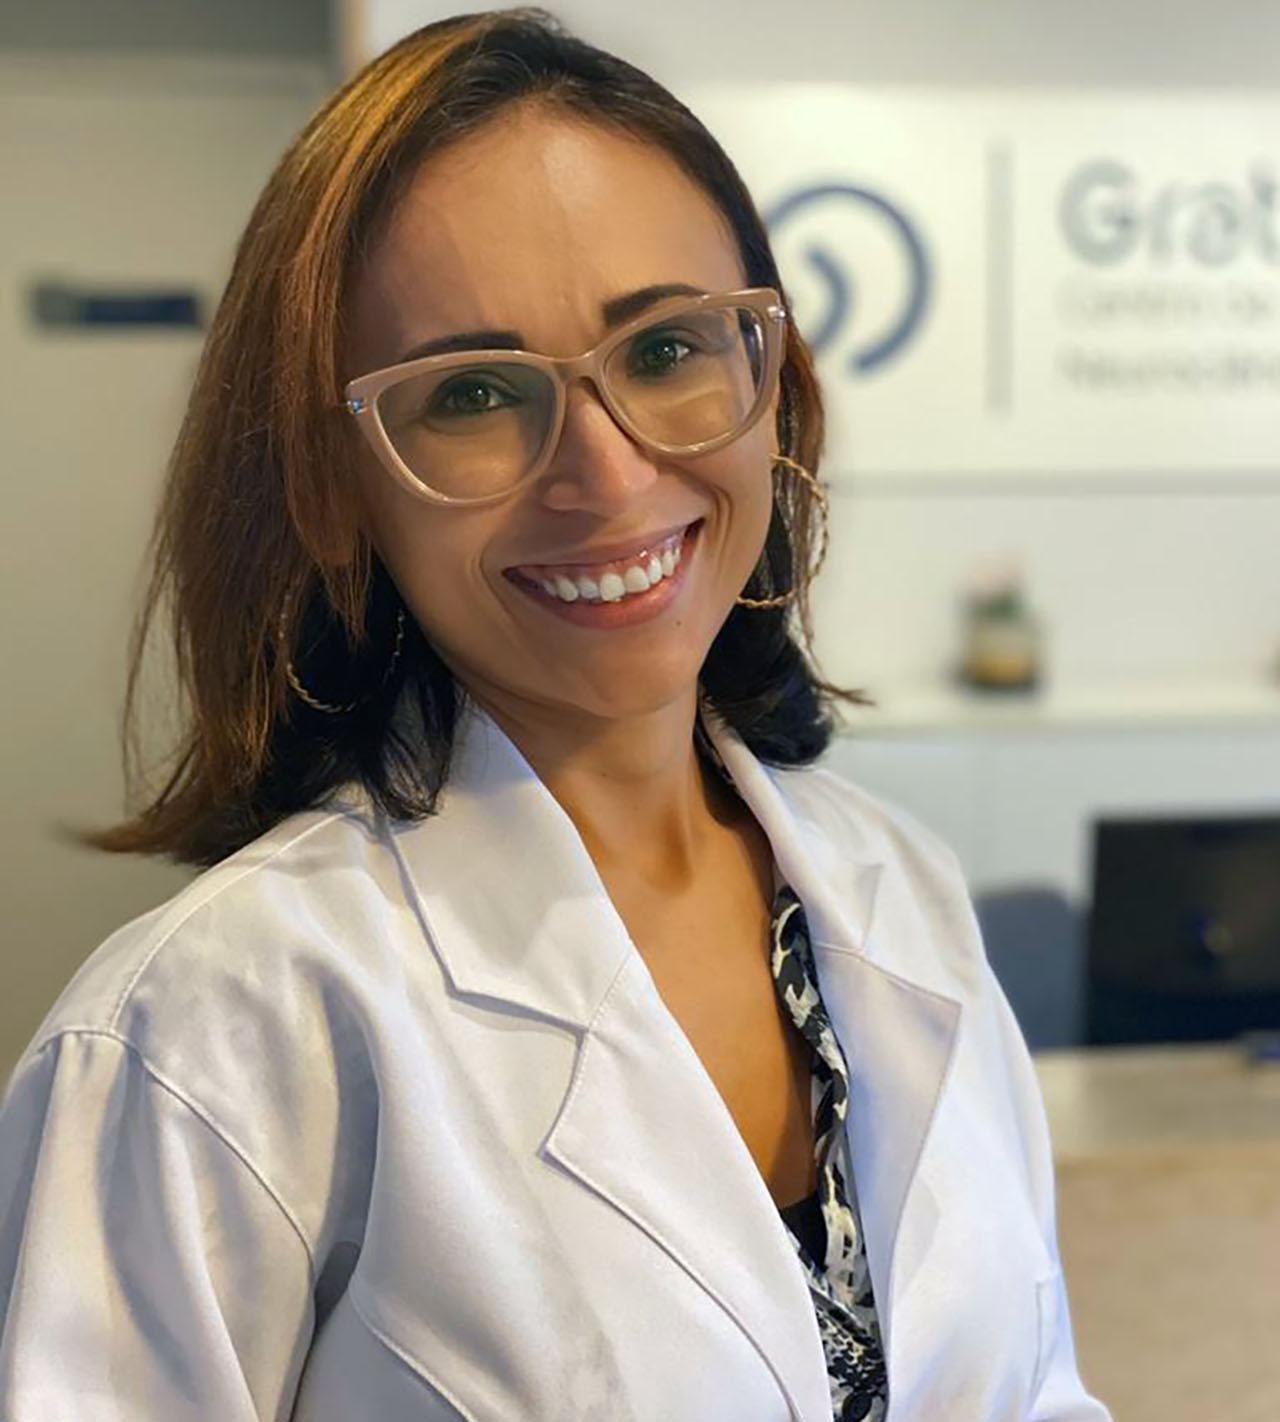 Carla Barbosa Brandão